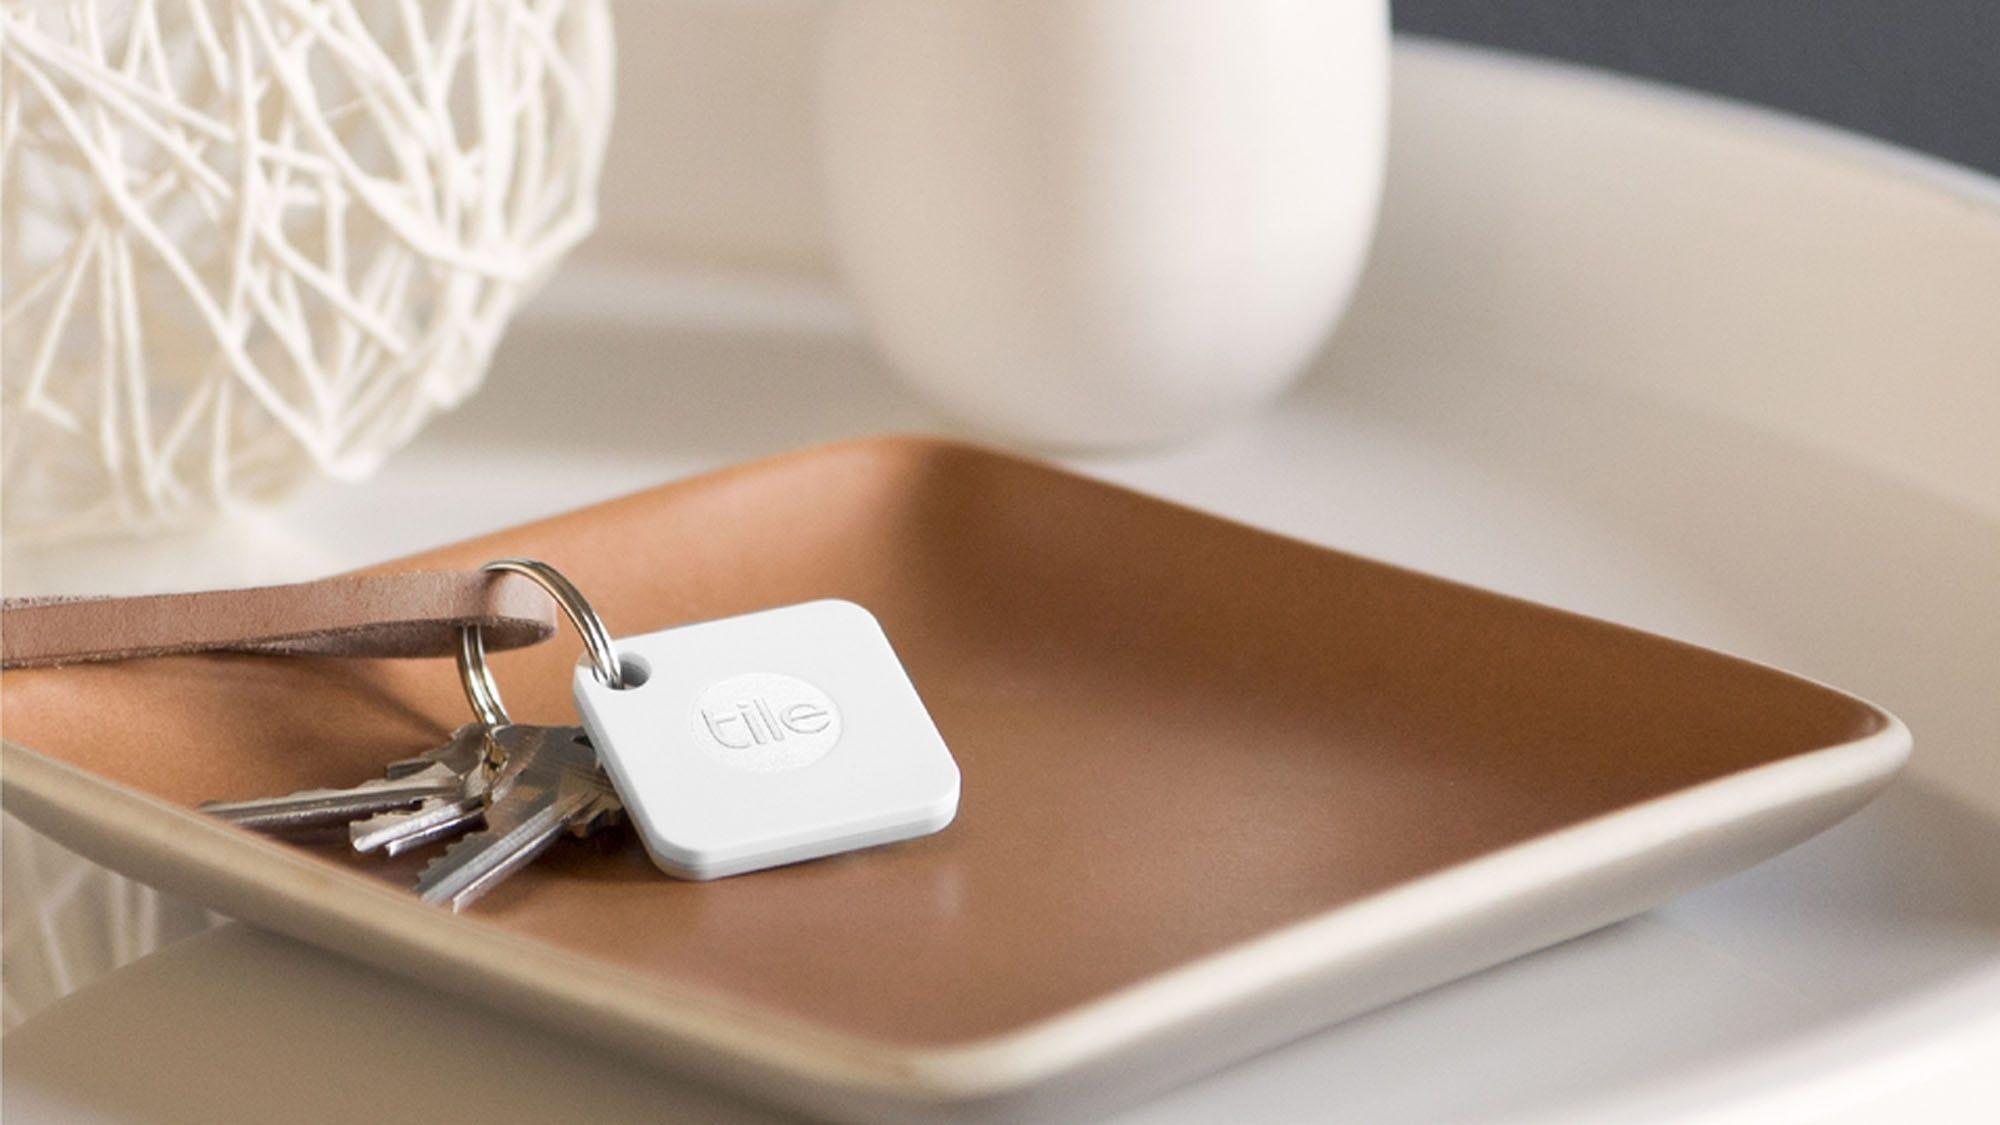 best product key finder windows 10